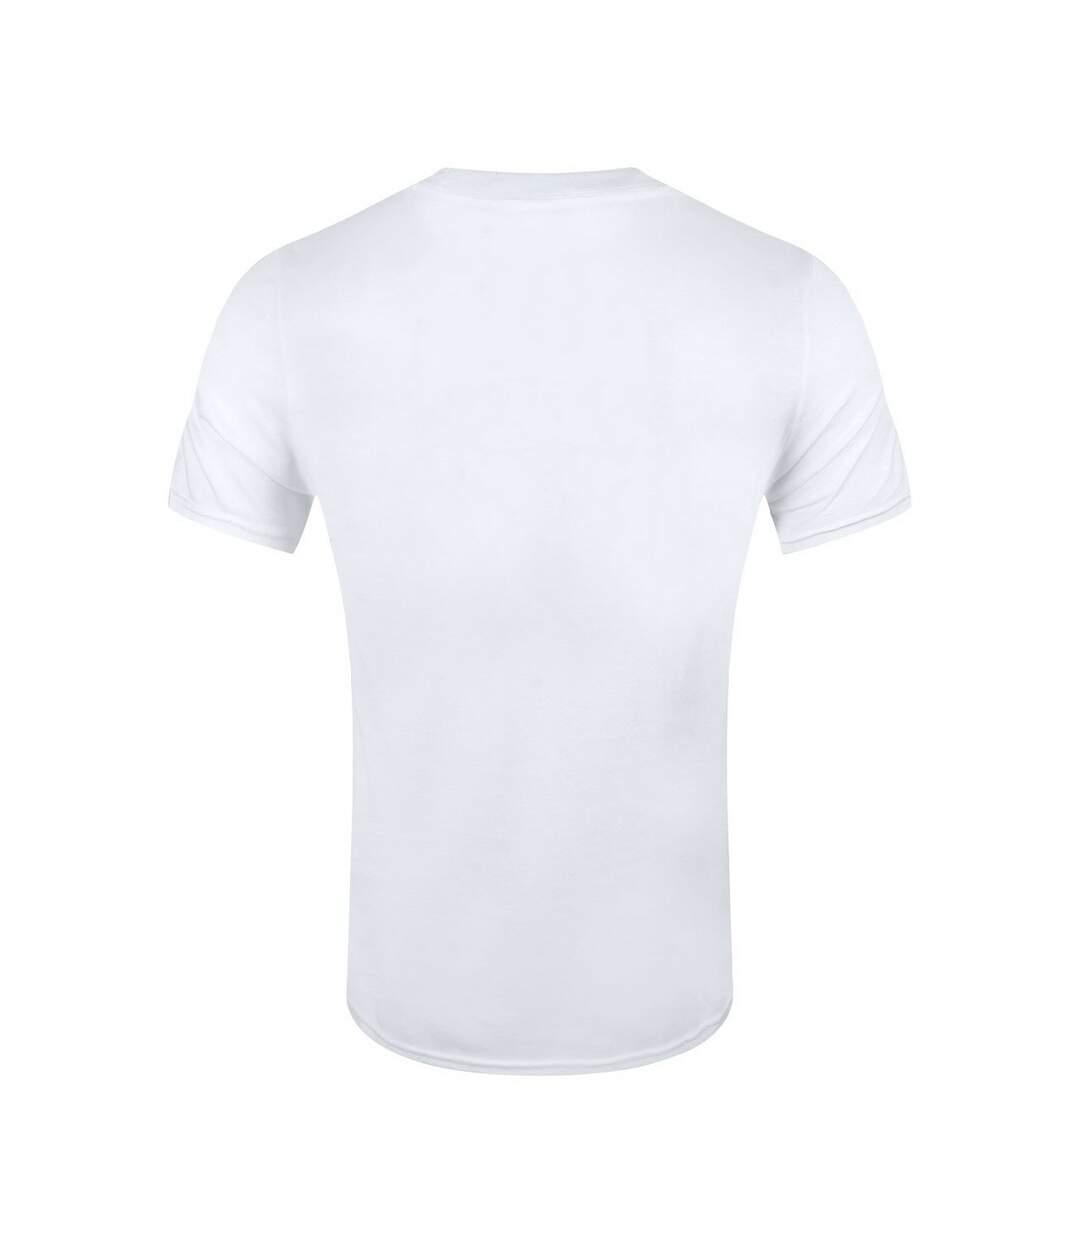 Tokyo Spirit Mens Kurai Orb Sub T-Shirt (White) - UTGR1867